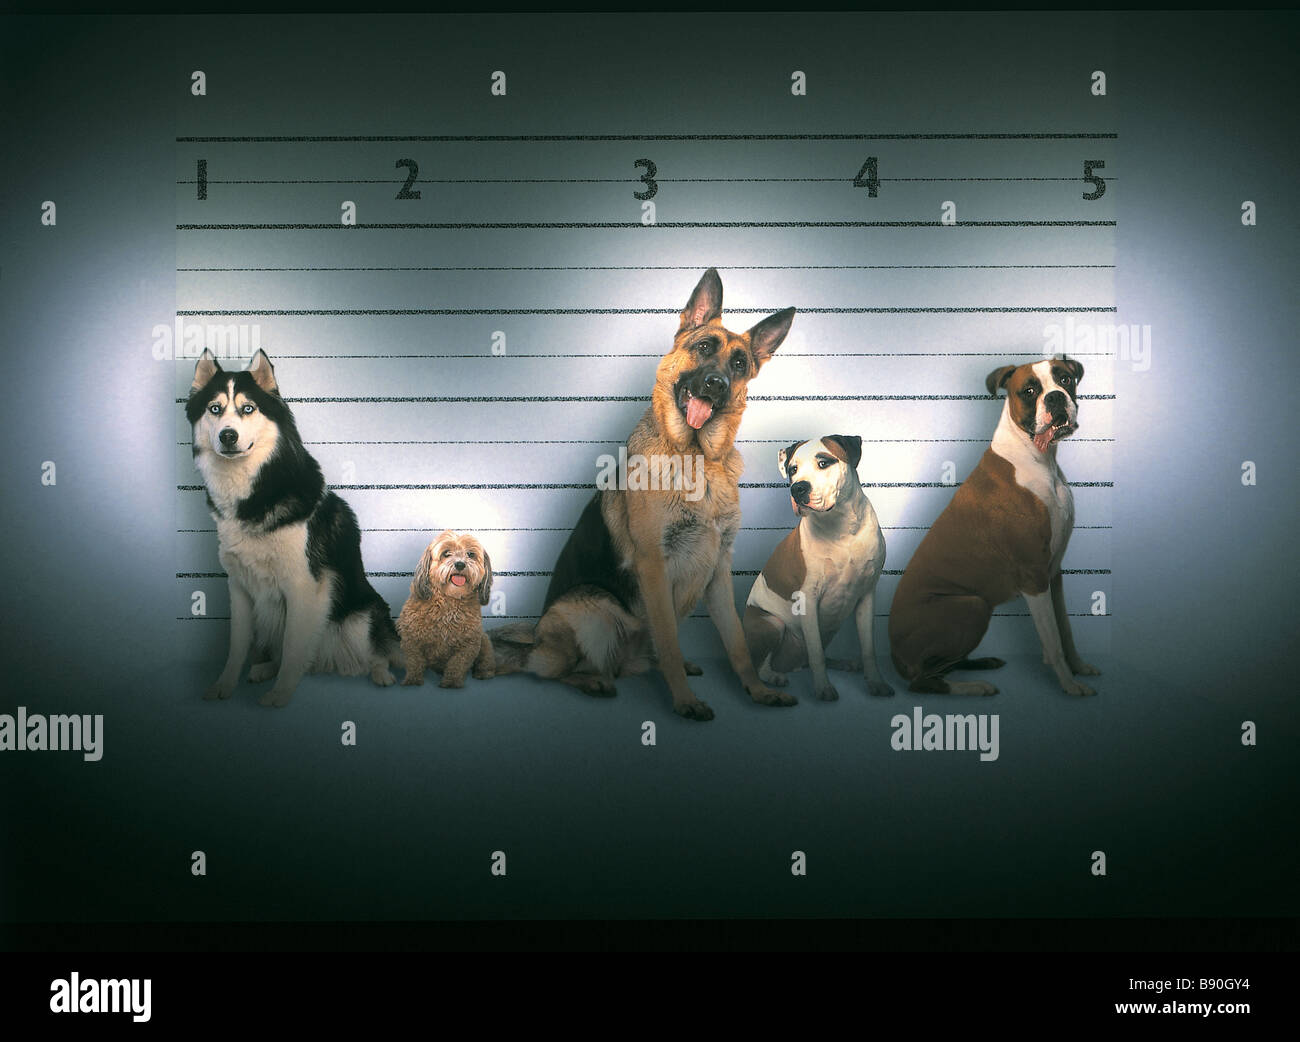 FL3053, KITCHIN/HURST penale line-up bad cani Foto Stock